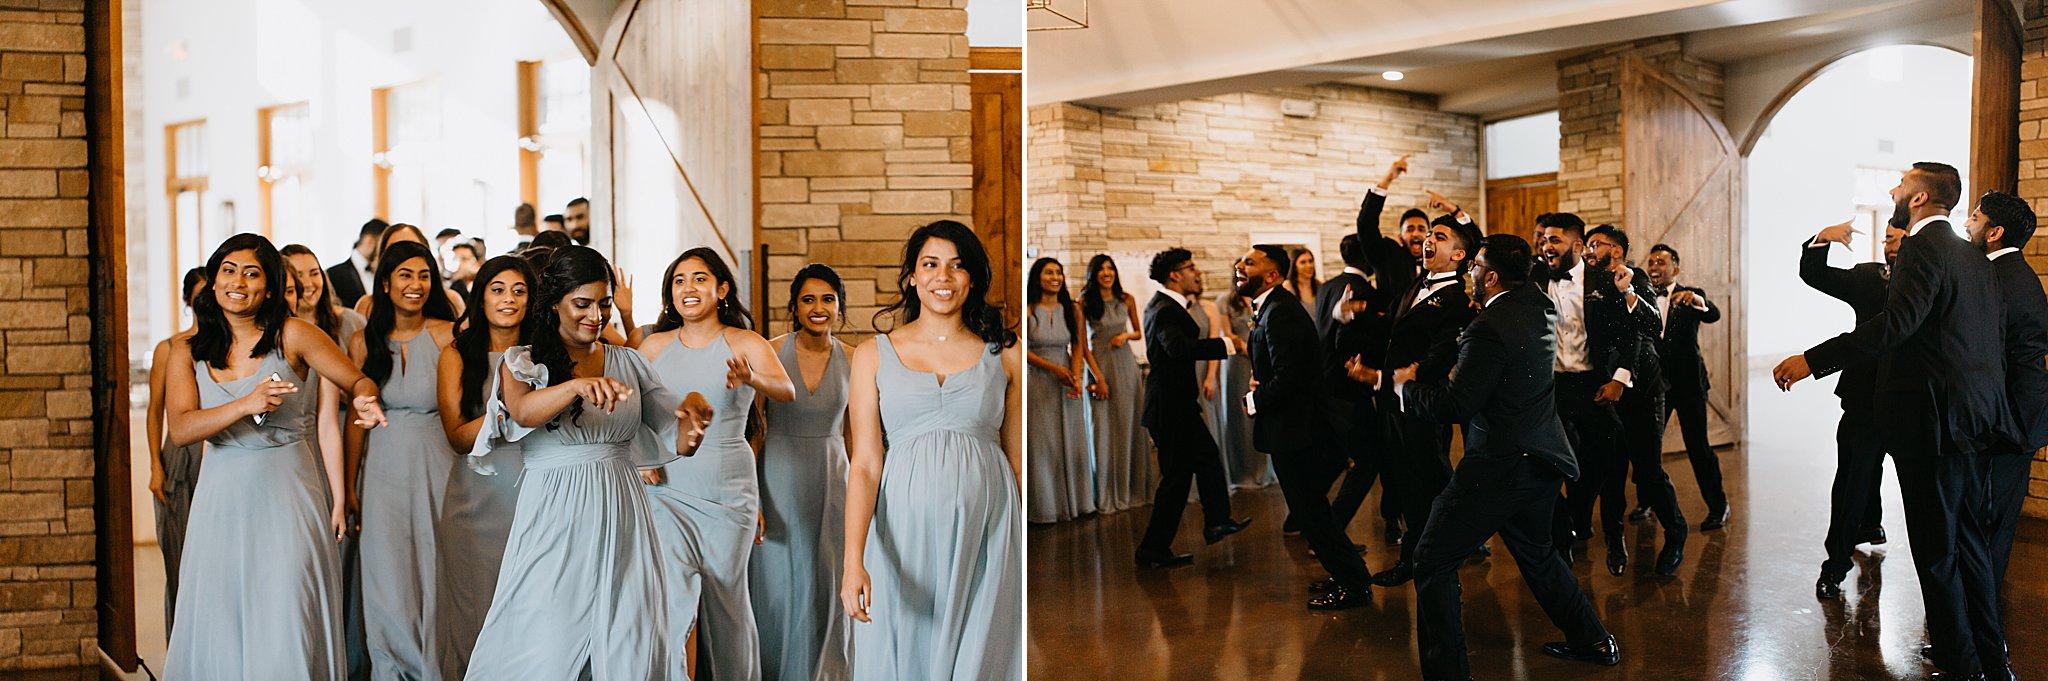 Wilderlove Co_Dripping Springs Texas_Texas Hill Country Wedding_Photography_0092.jpg